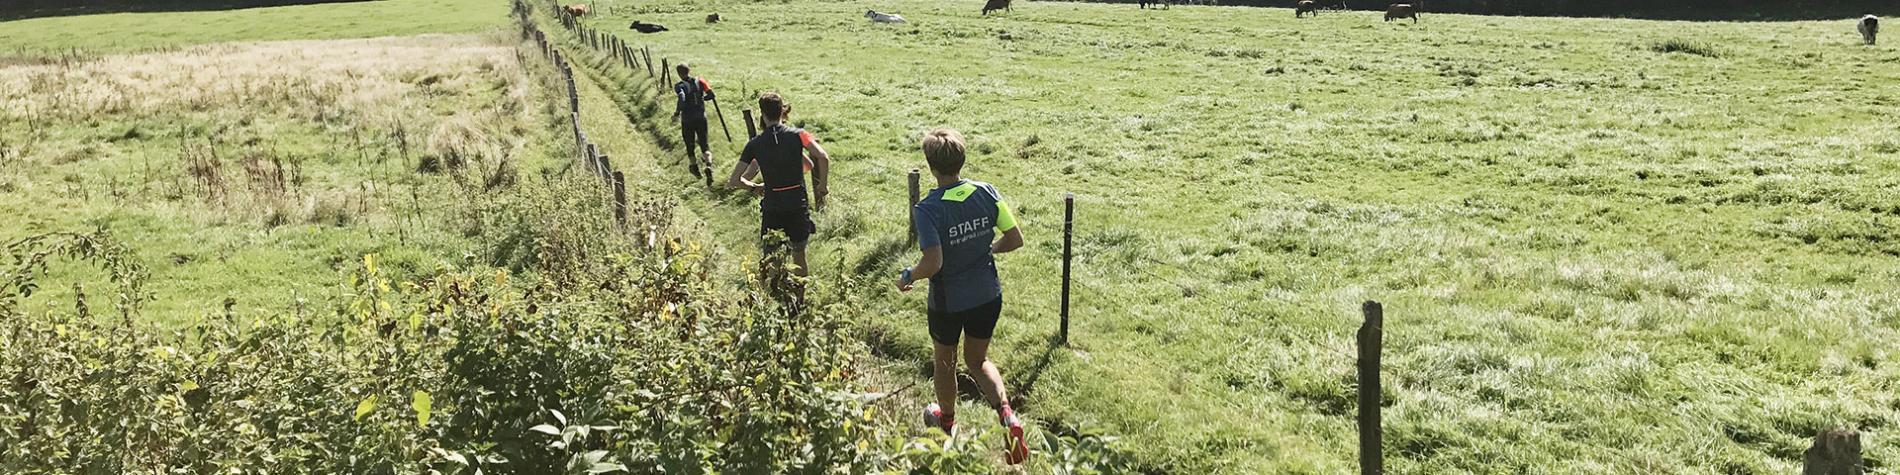 Extratrail - Trail - marche nordique - Ardenne sauvage